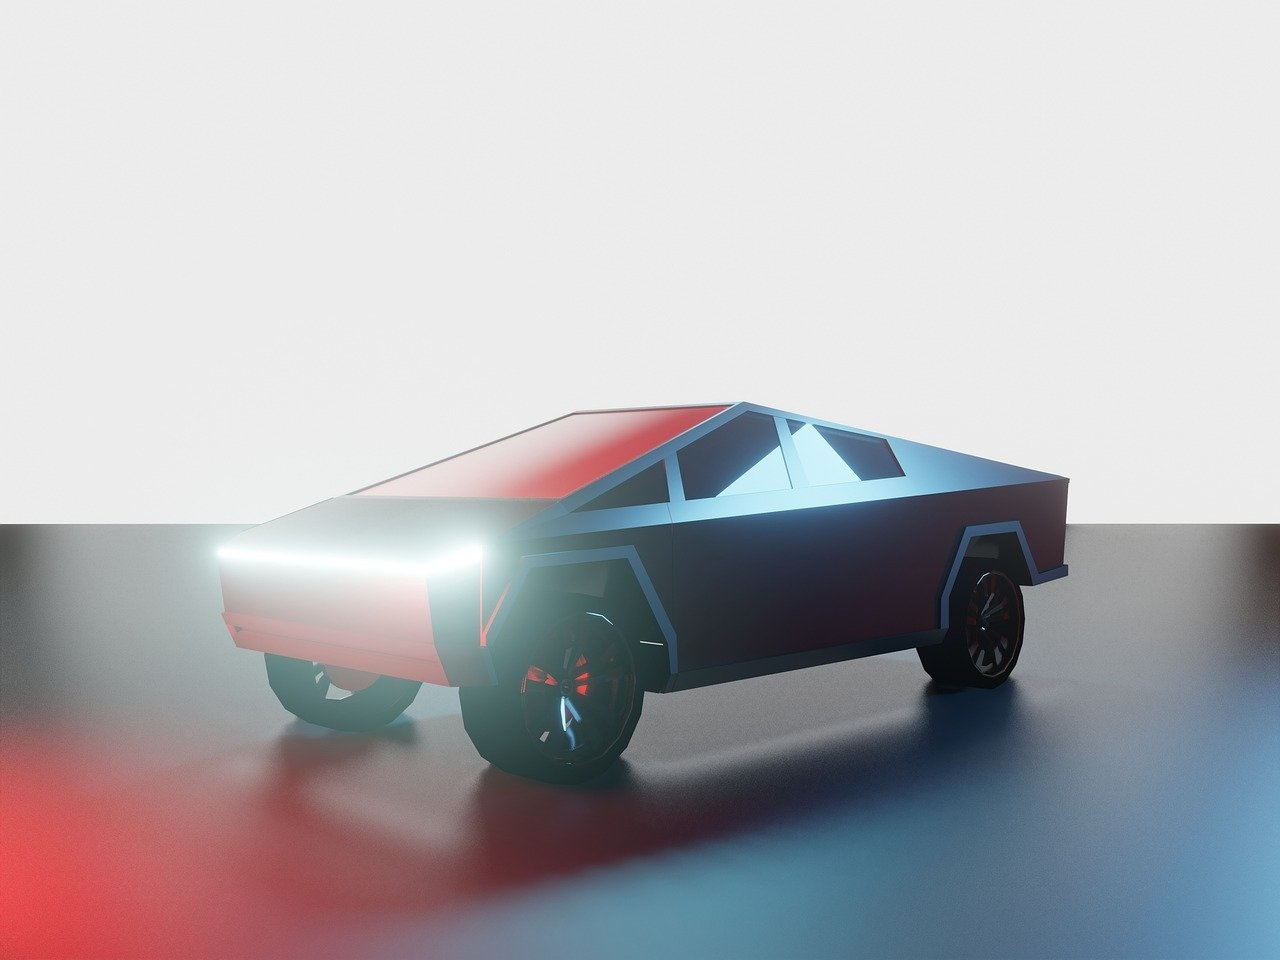 Tesla RC Cybertruck